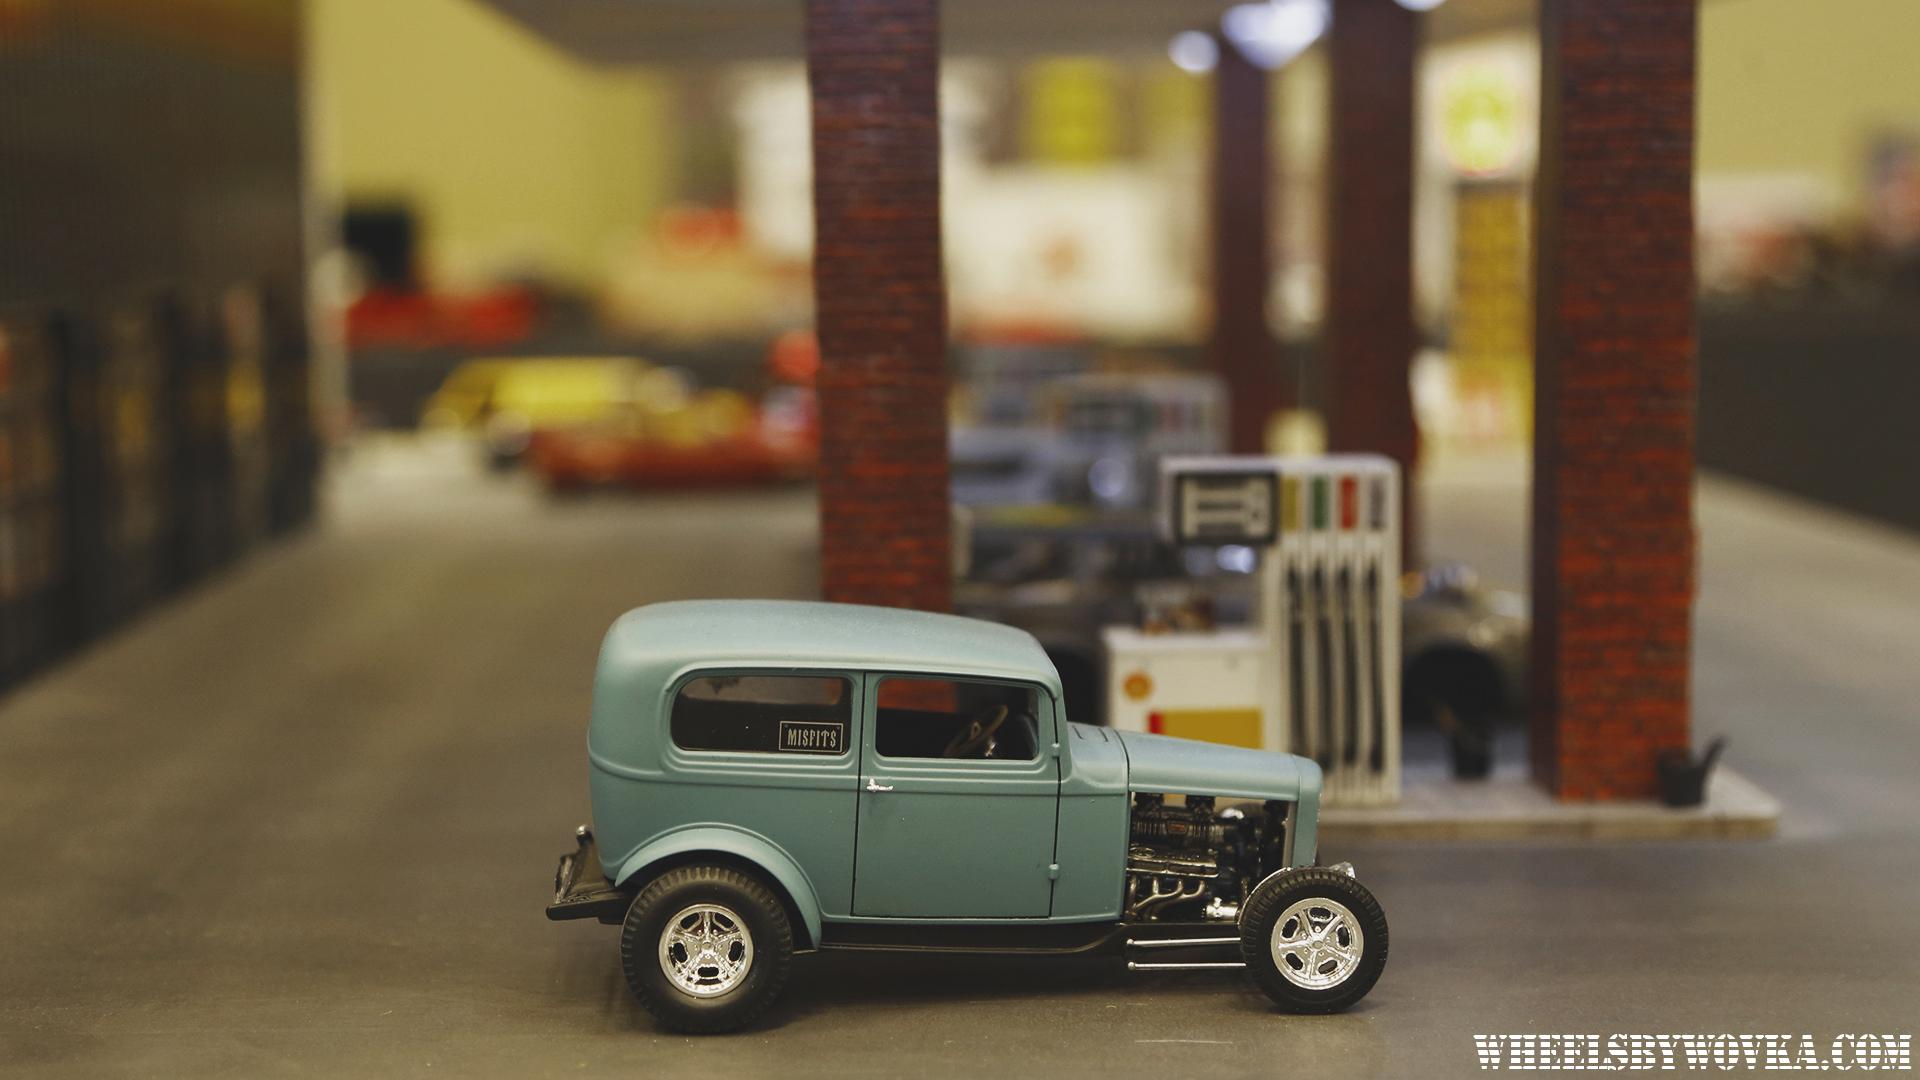 model-car-show-frankfurt-2017-50